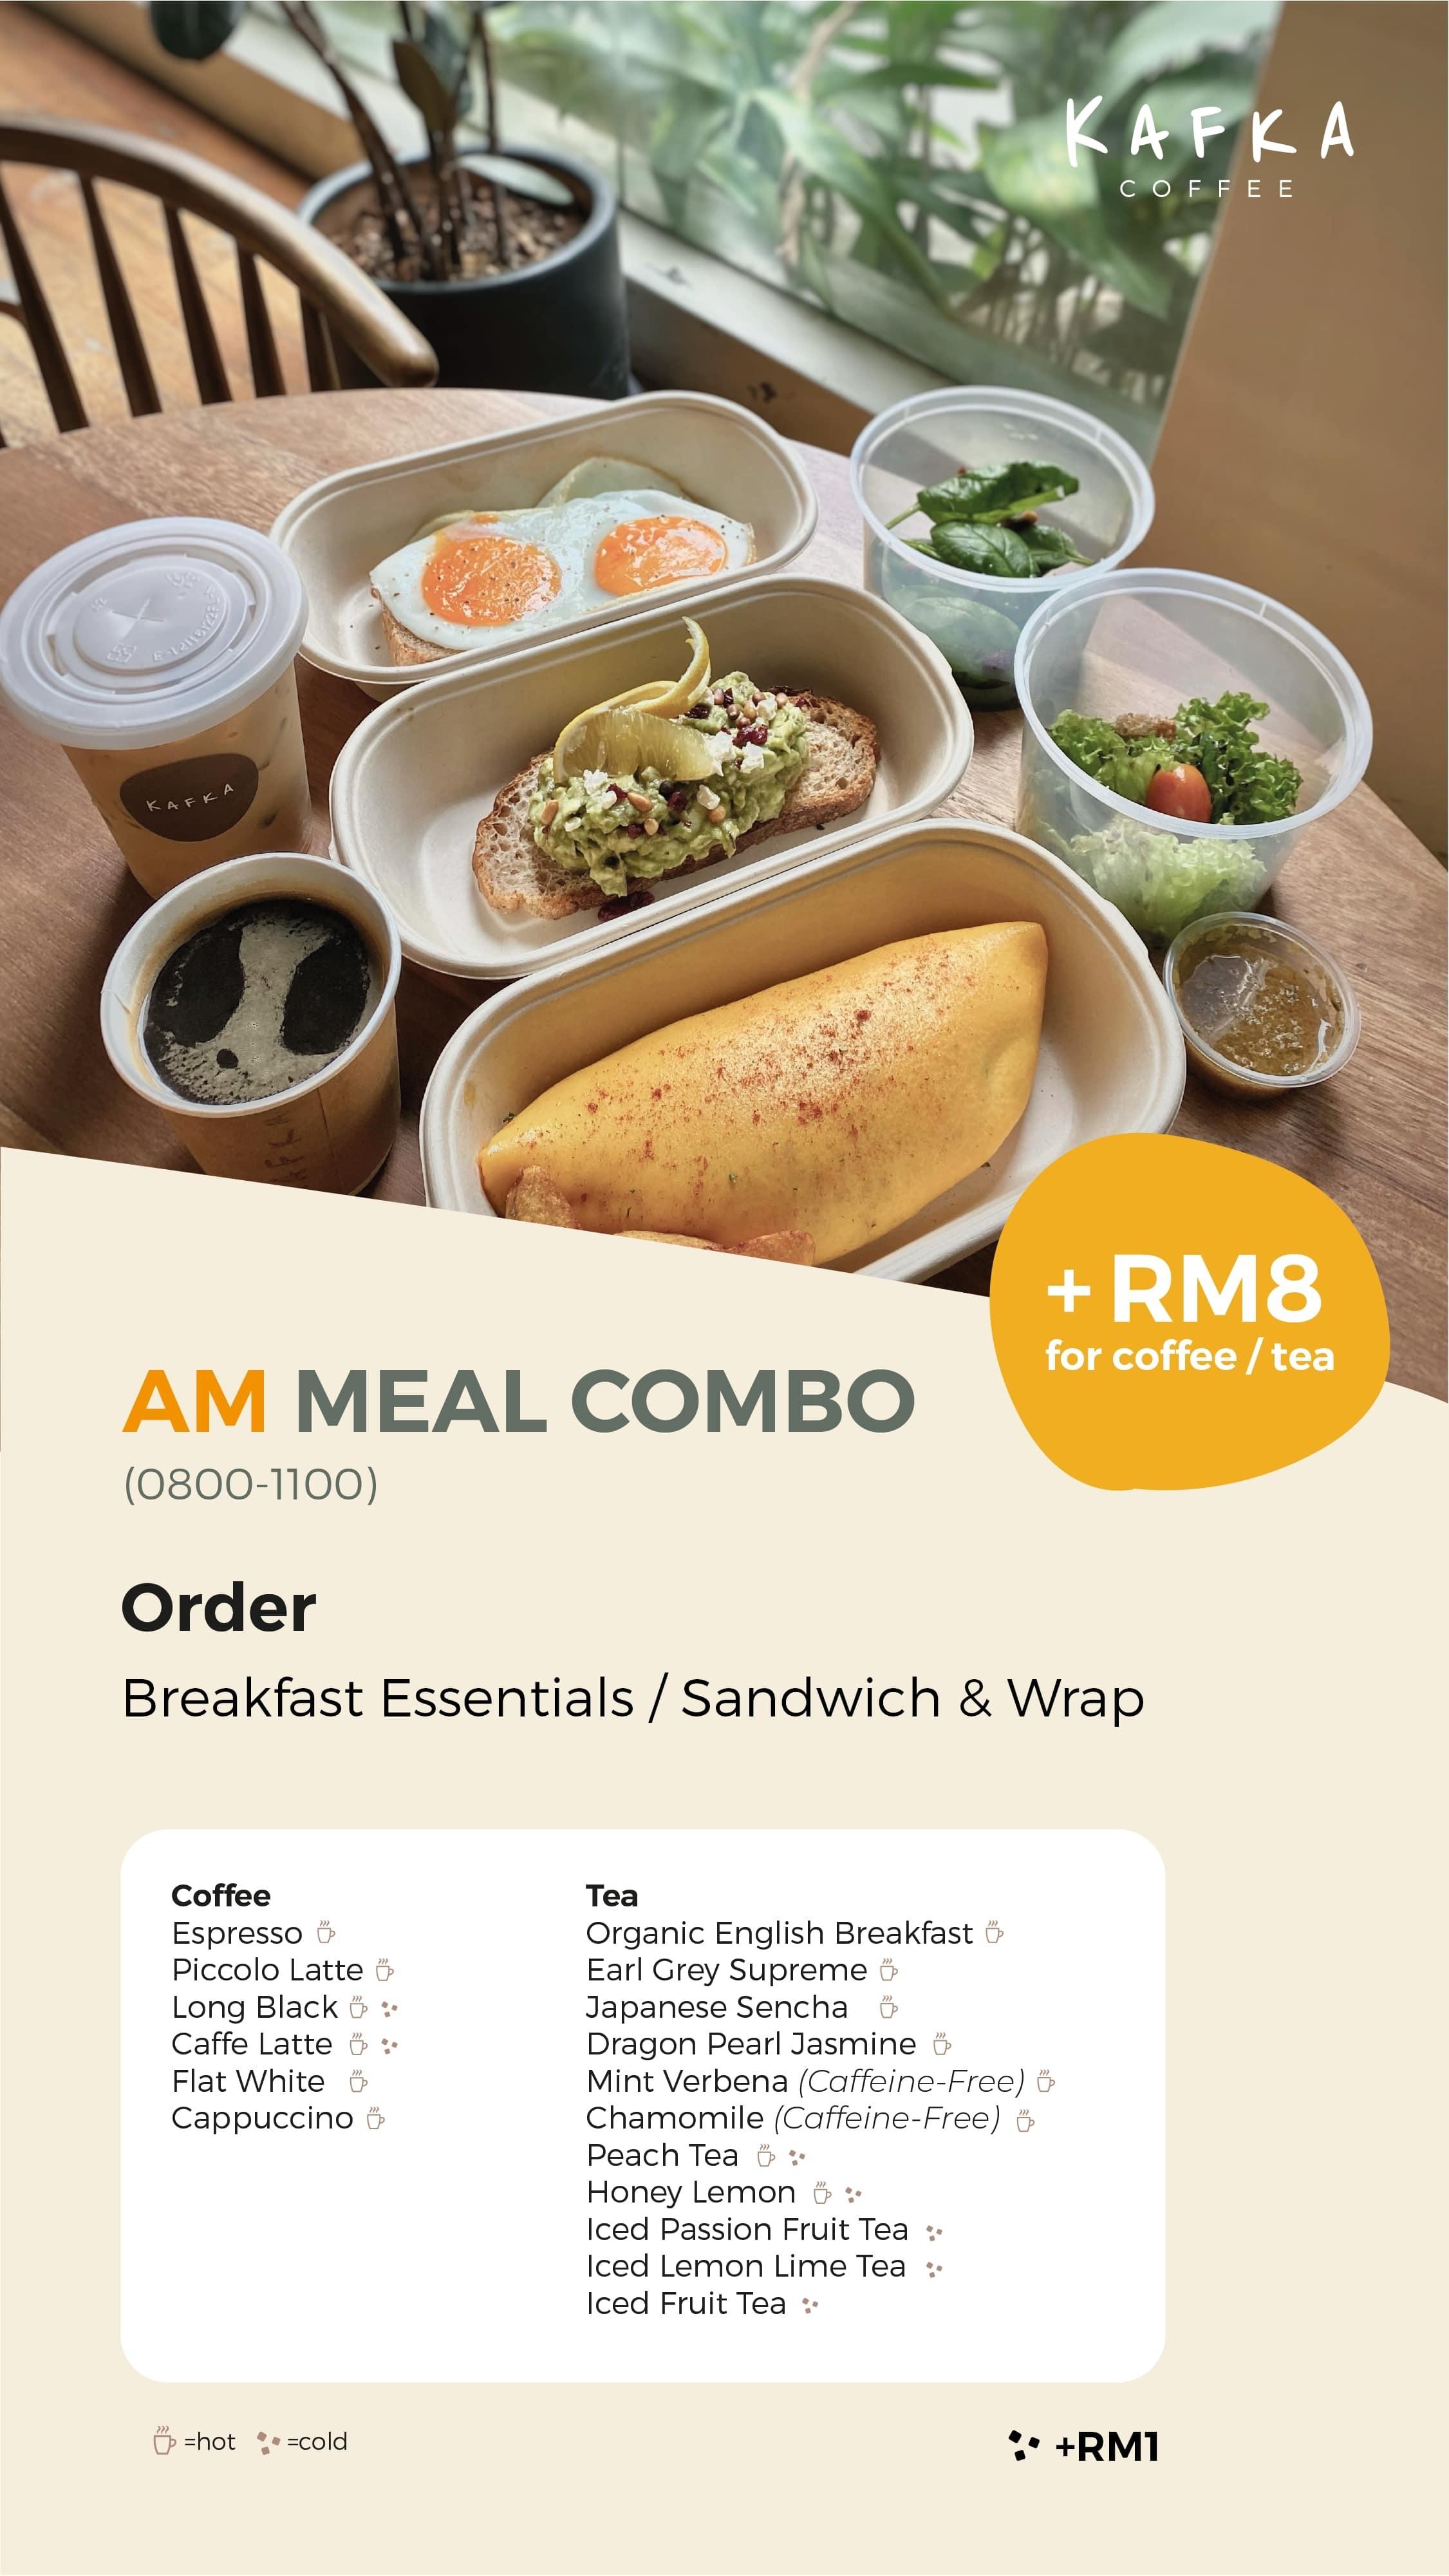 AM Meal Combo by Kafka Cafe